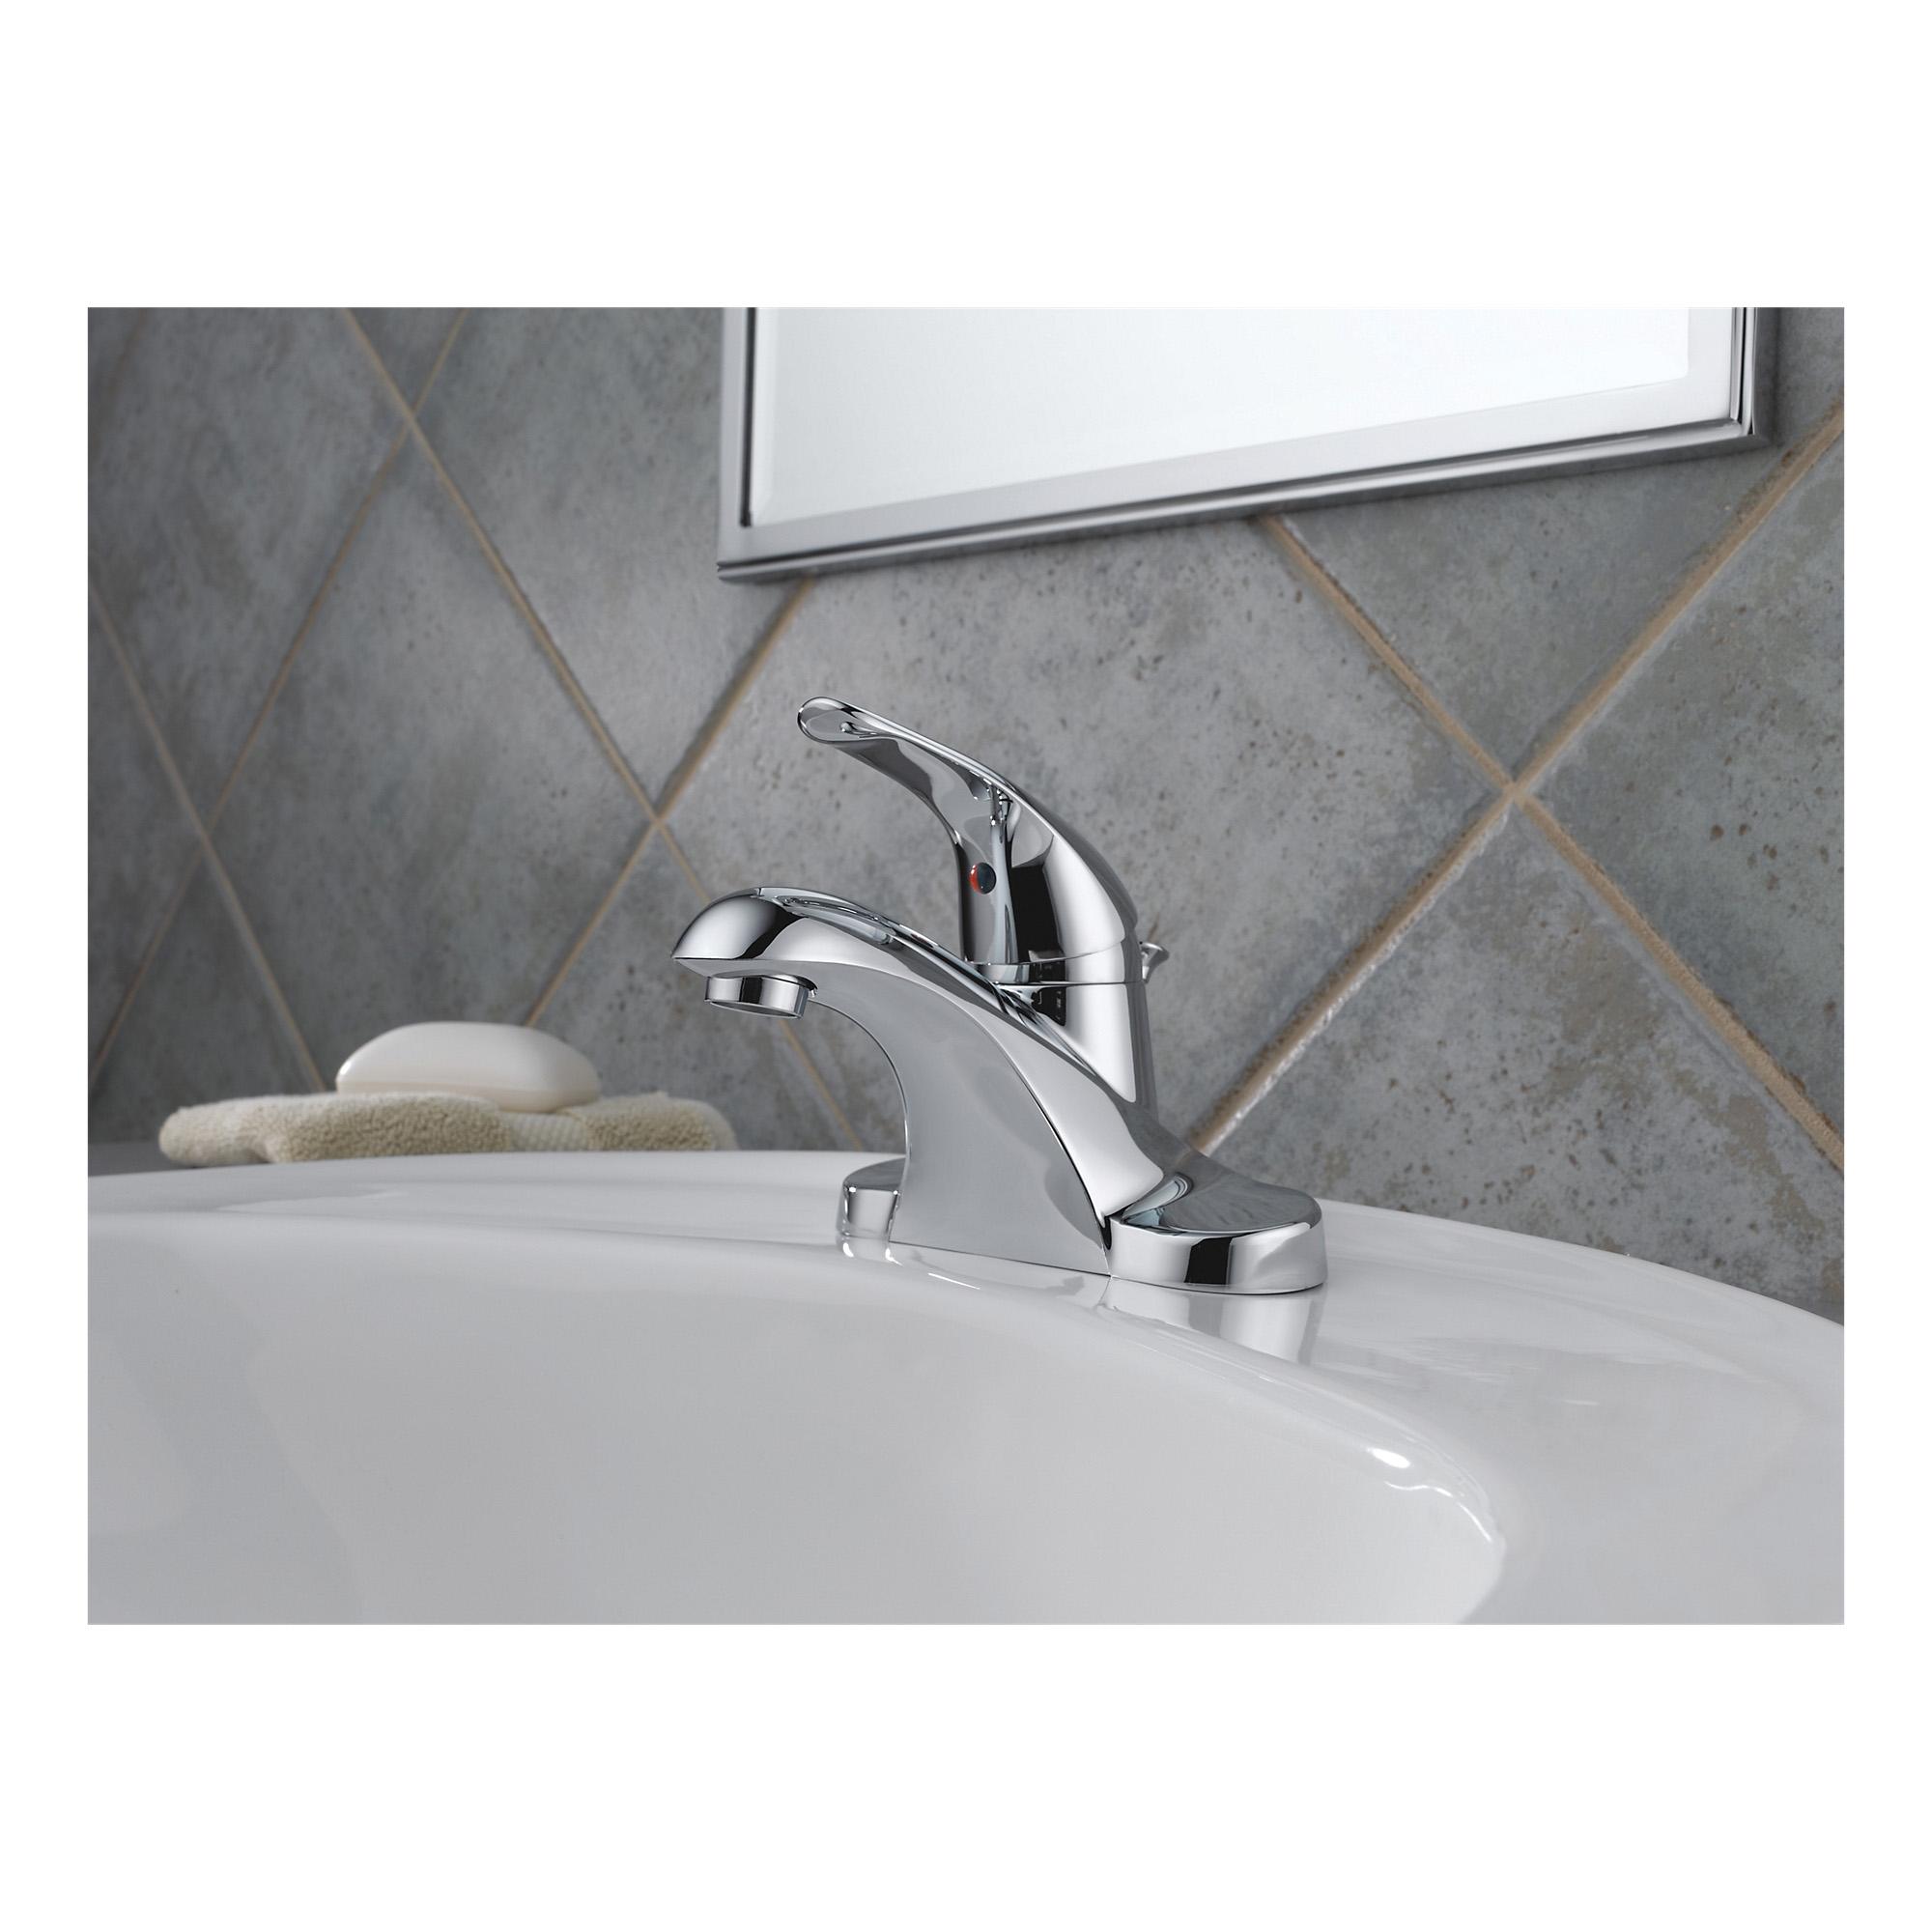 DELTA® B510LF Foundations® Centerset Lavatory Faucet, Polished Chrome, 1 Handles, Pop-Up Drain, 1.5 gpm Flow Rate